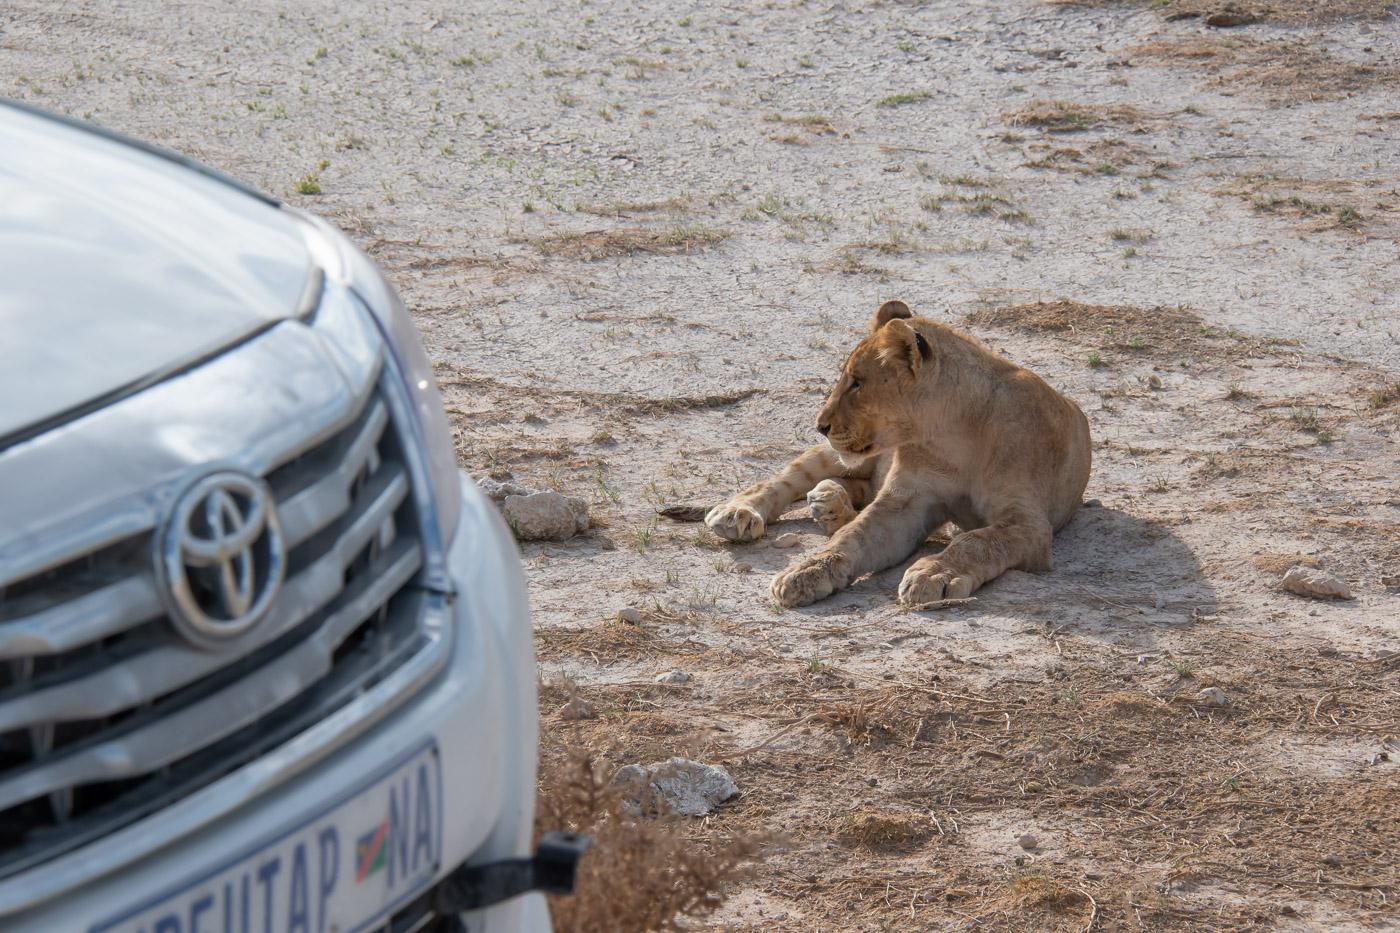 Etosha National Park leeuw spotten